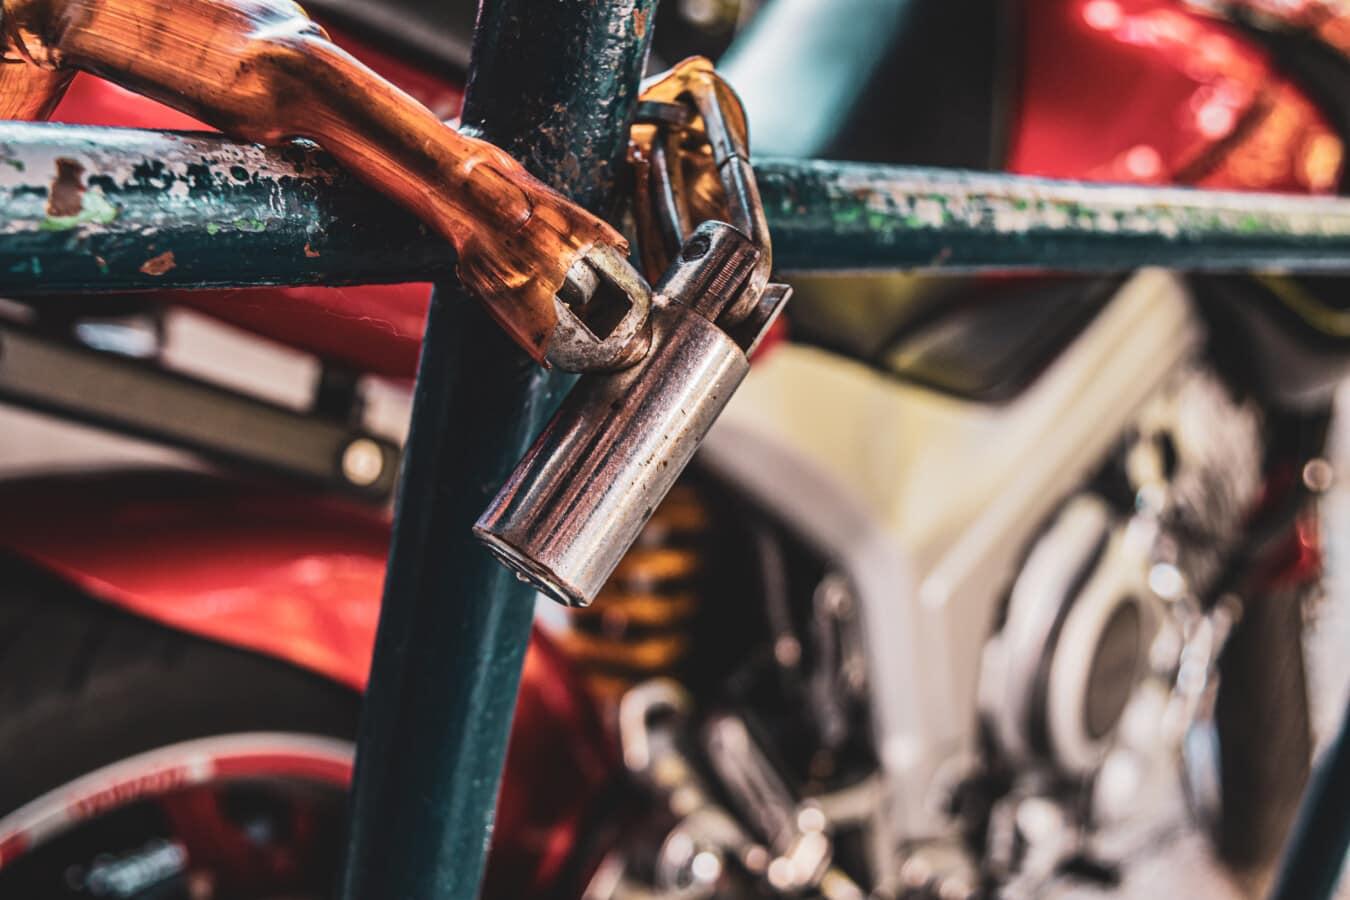 Parkplatz, Motorrad, Sicherheit, Sperre, Kette, Zaun, aus nächster Nähe, Fahrzeug, Rad, Fahrrad